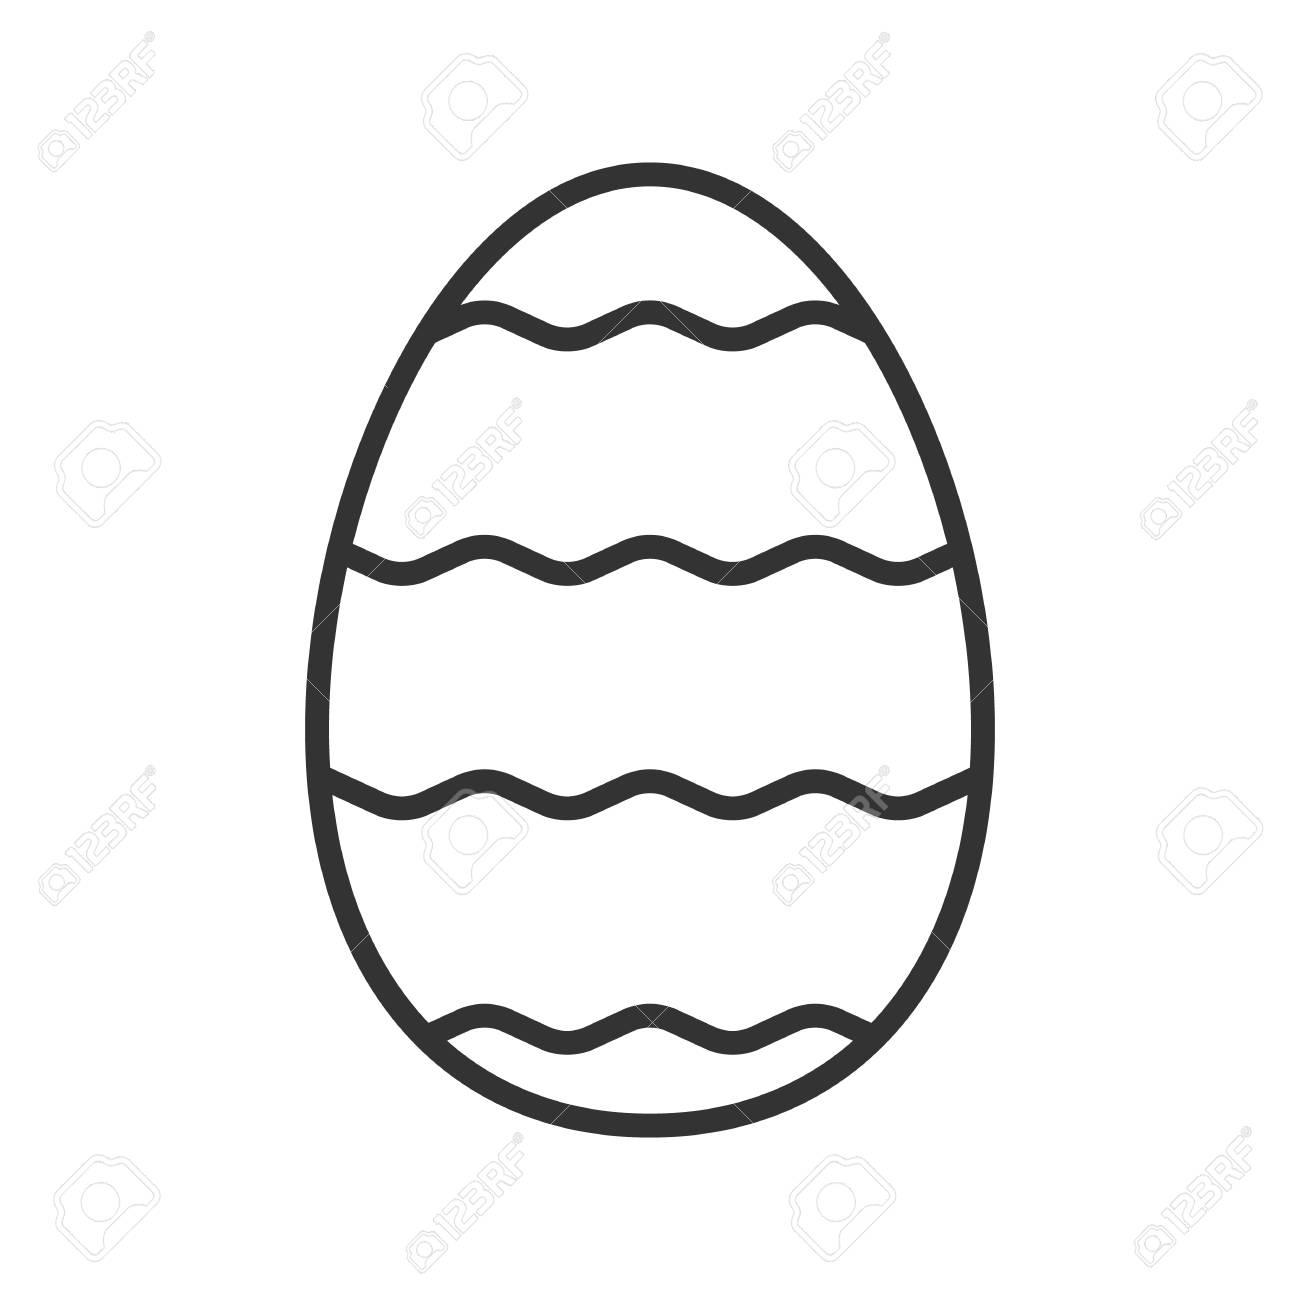 Easter egg linear icon thin line illustration easter egg with easter egg linear icon thin line illustration easter egg with waves pattern contour symbol buycottarizona